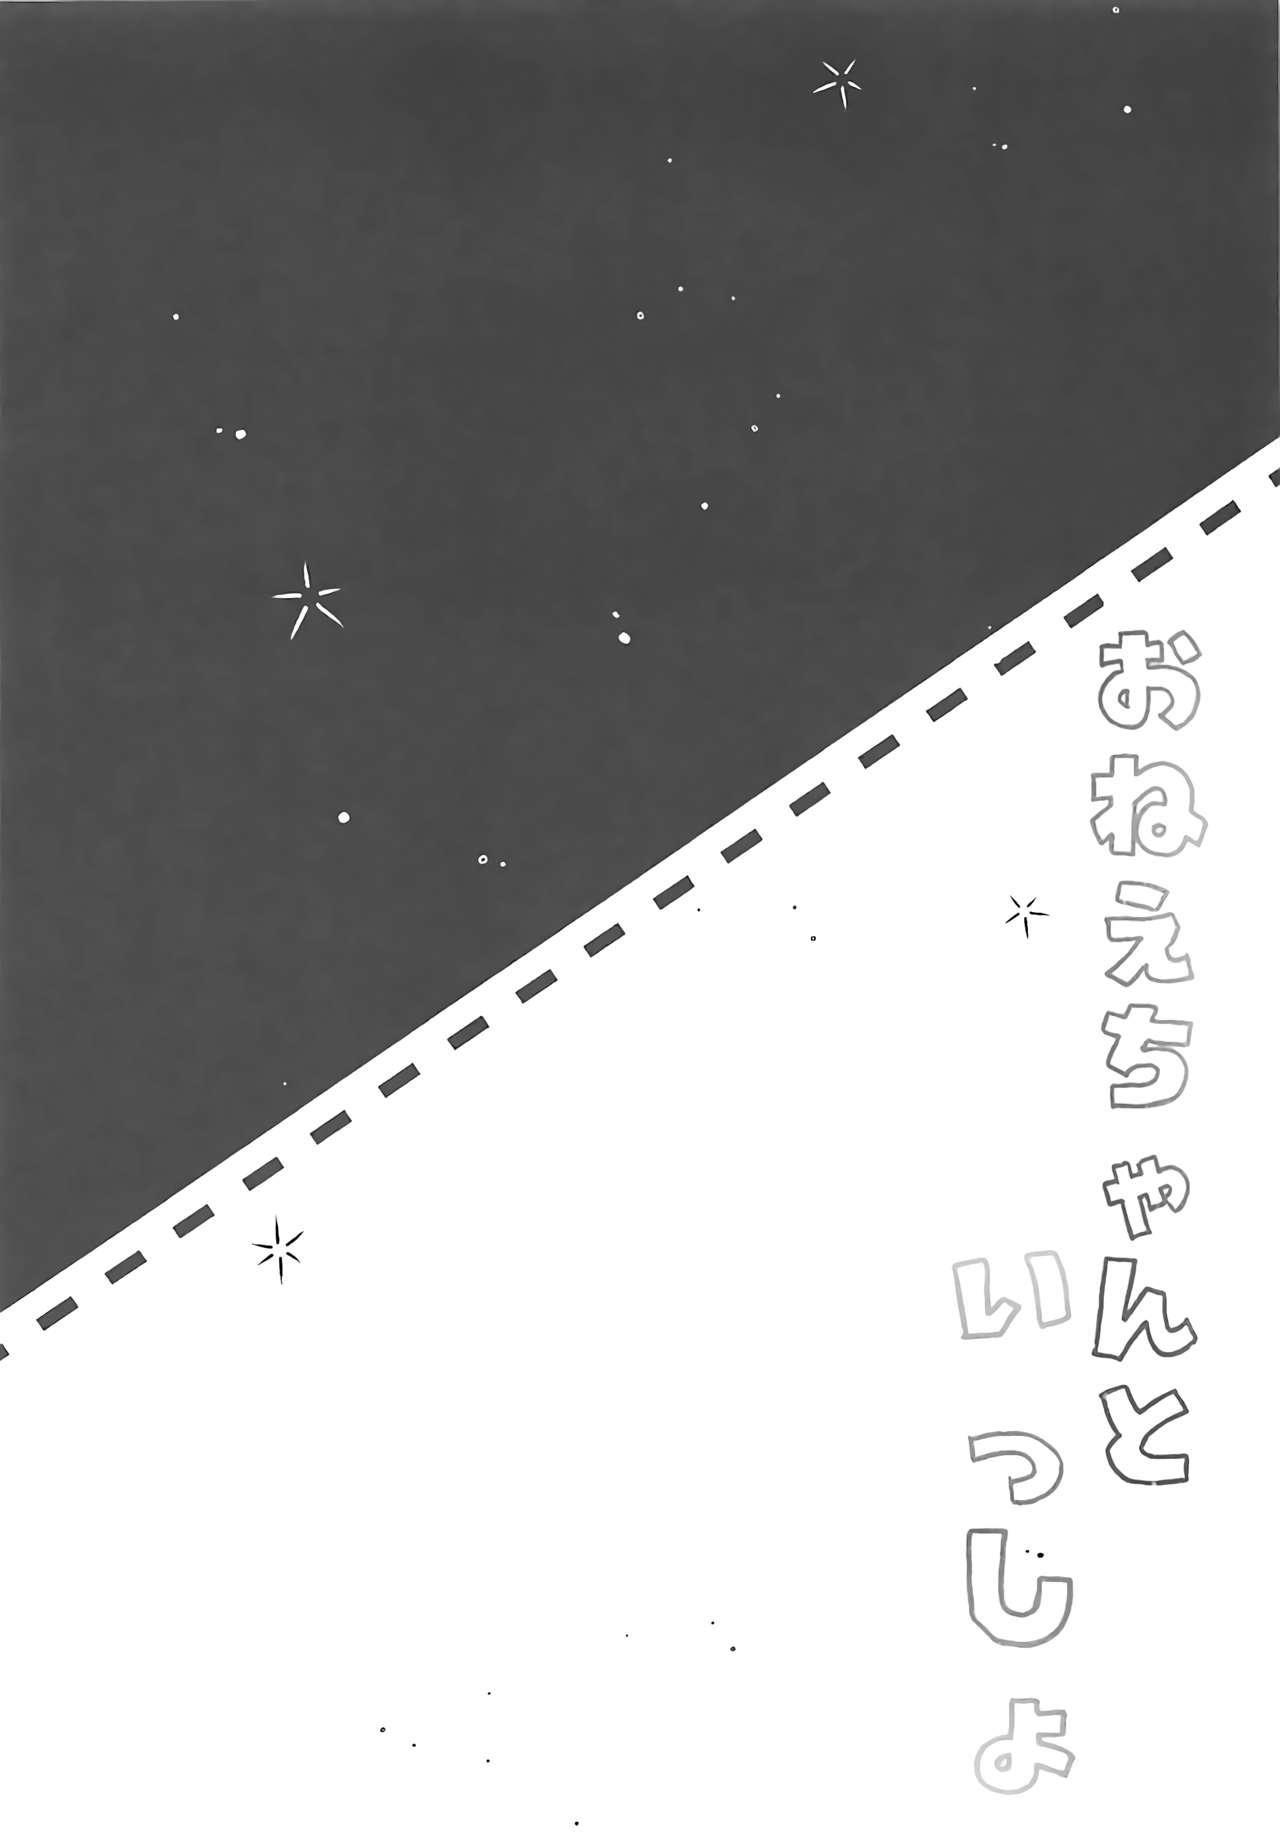 (COMIC1☆13) [MEiTEiTEi. (Komiya Hitoma)] Onee-chan to Issho | Together with Onee-chan (Azur Lane) [English] 2